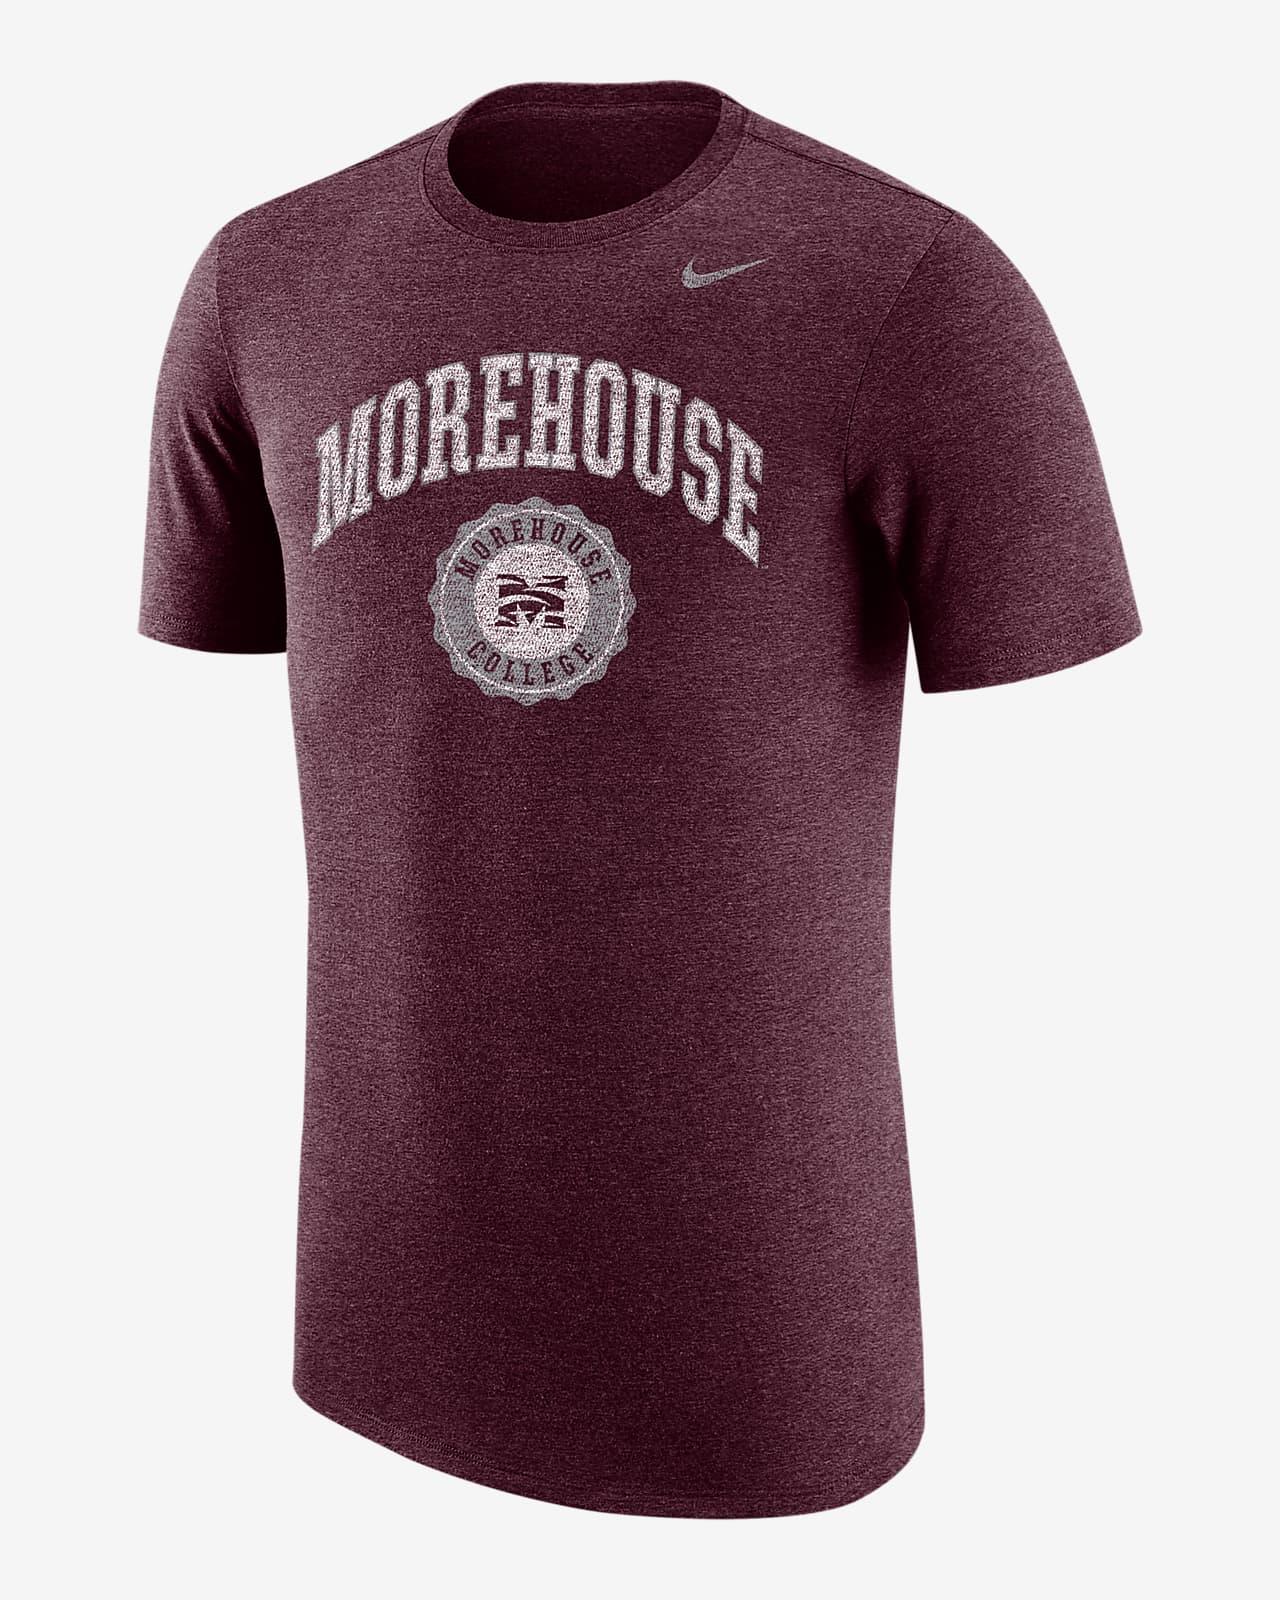 Nike College (Morehouse) Men's T-Shirt